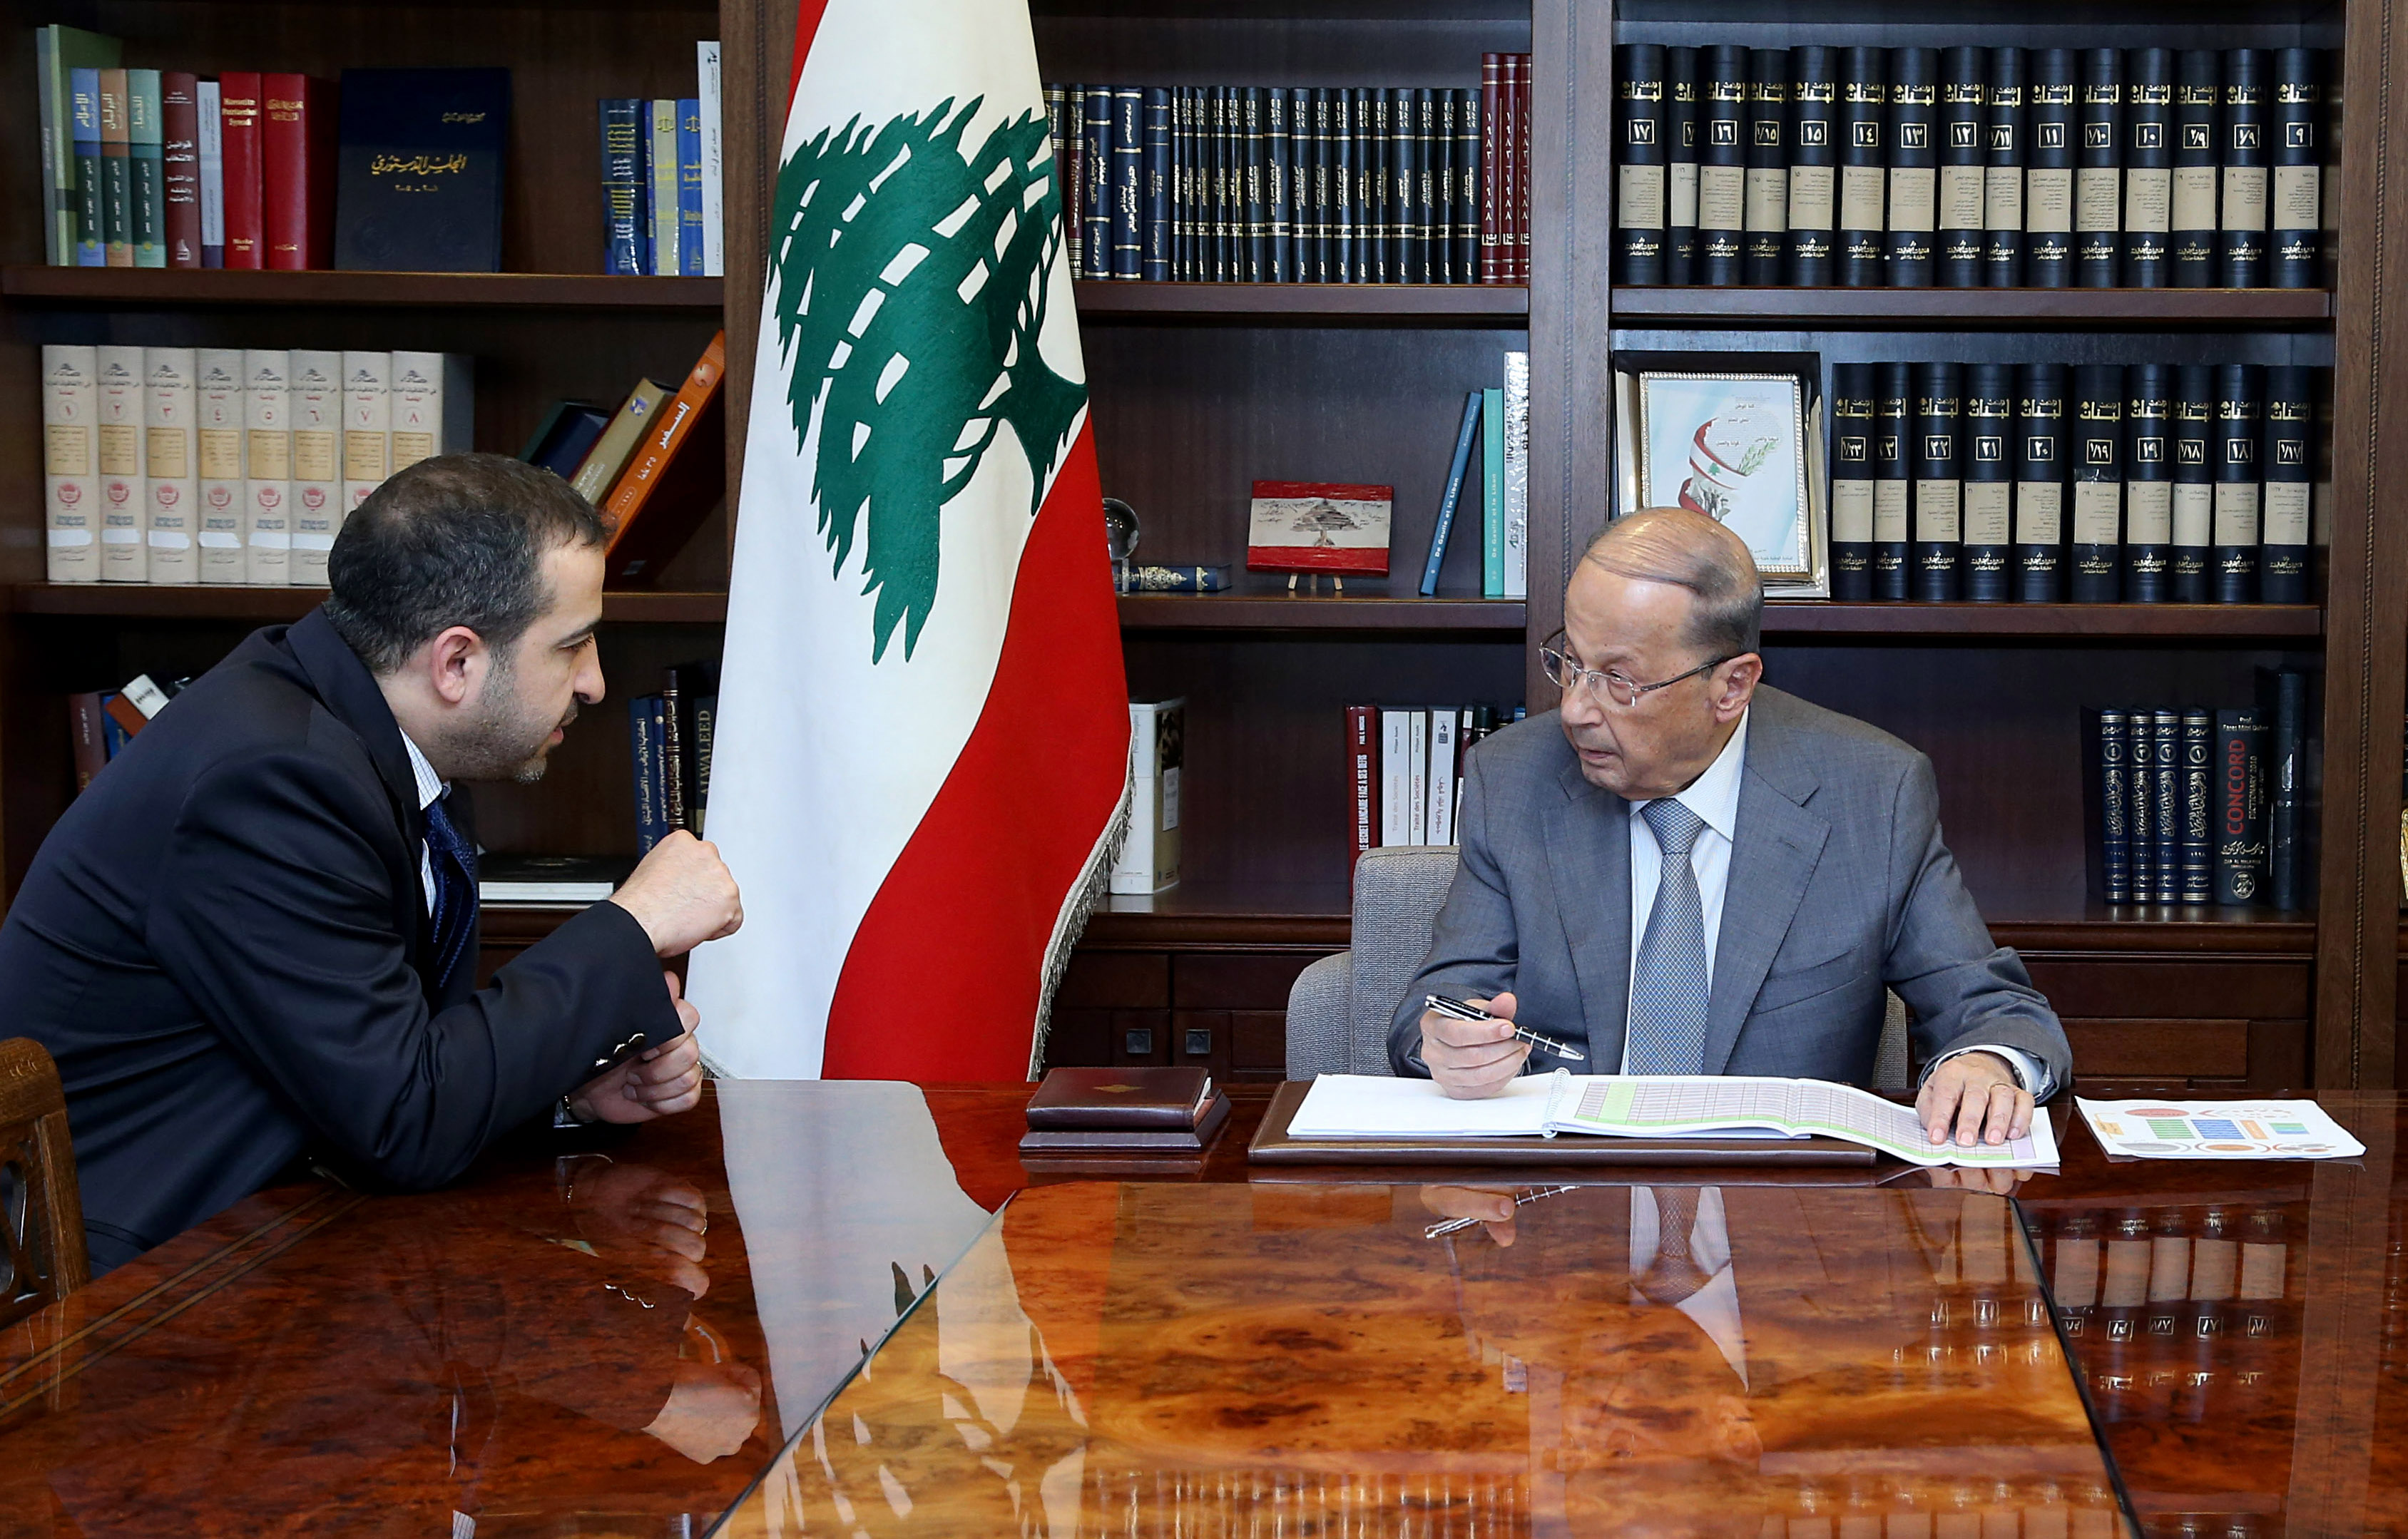 01 - Minister Ghassan Atallah 1